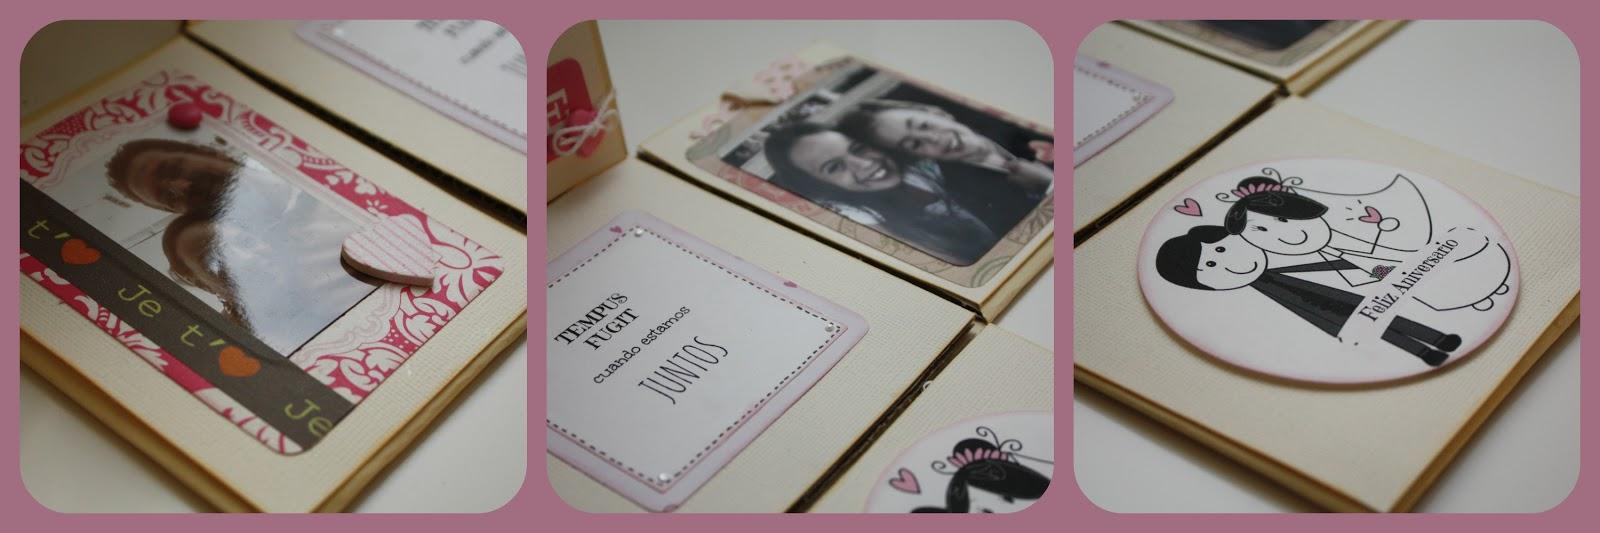 Tu fiesta chic caja sorpresa aniversario - Manualidades regalo boda ...